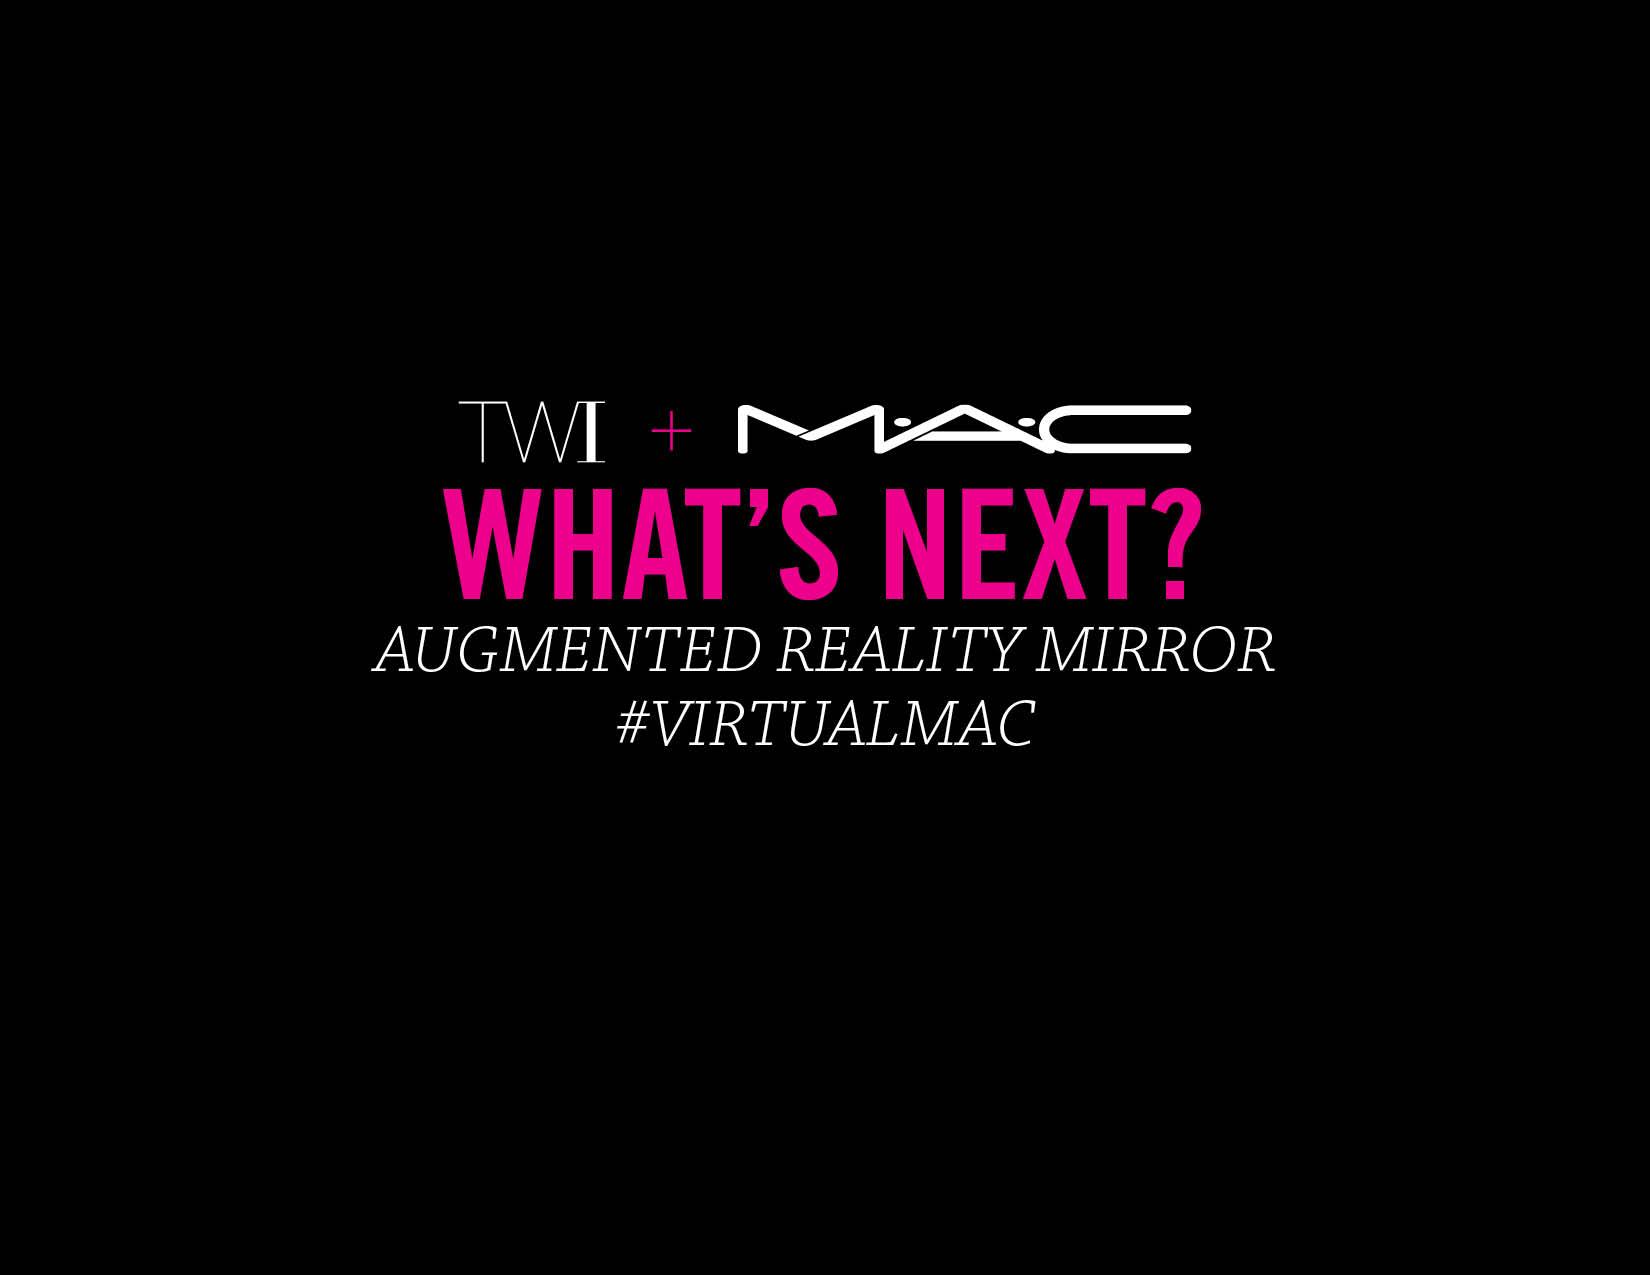 the_wieland_initiative_mac_cosmetics_ar_mirror_whats_next_2018_01_101.jpg